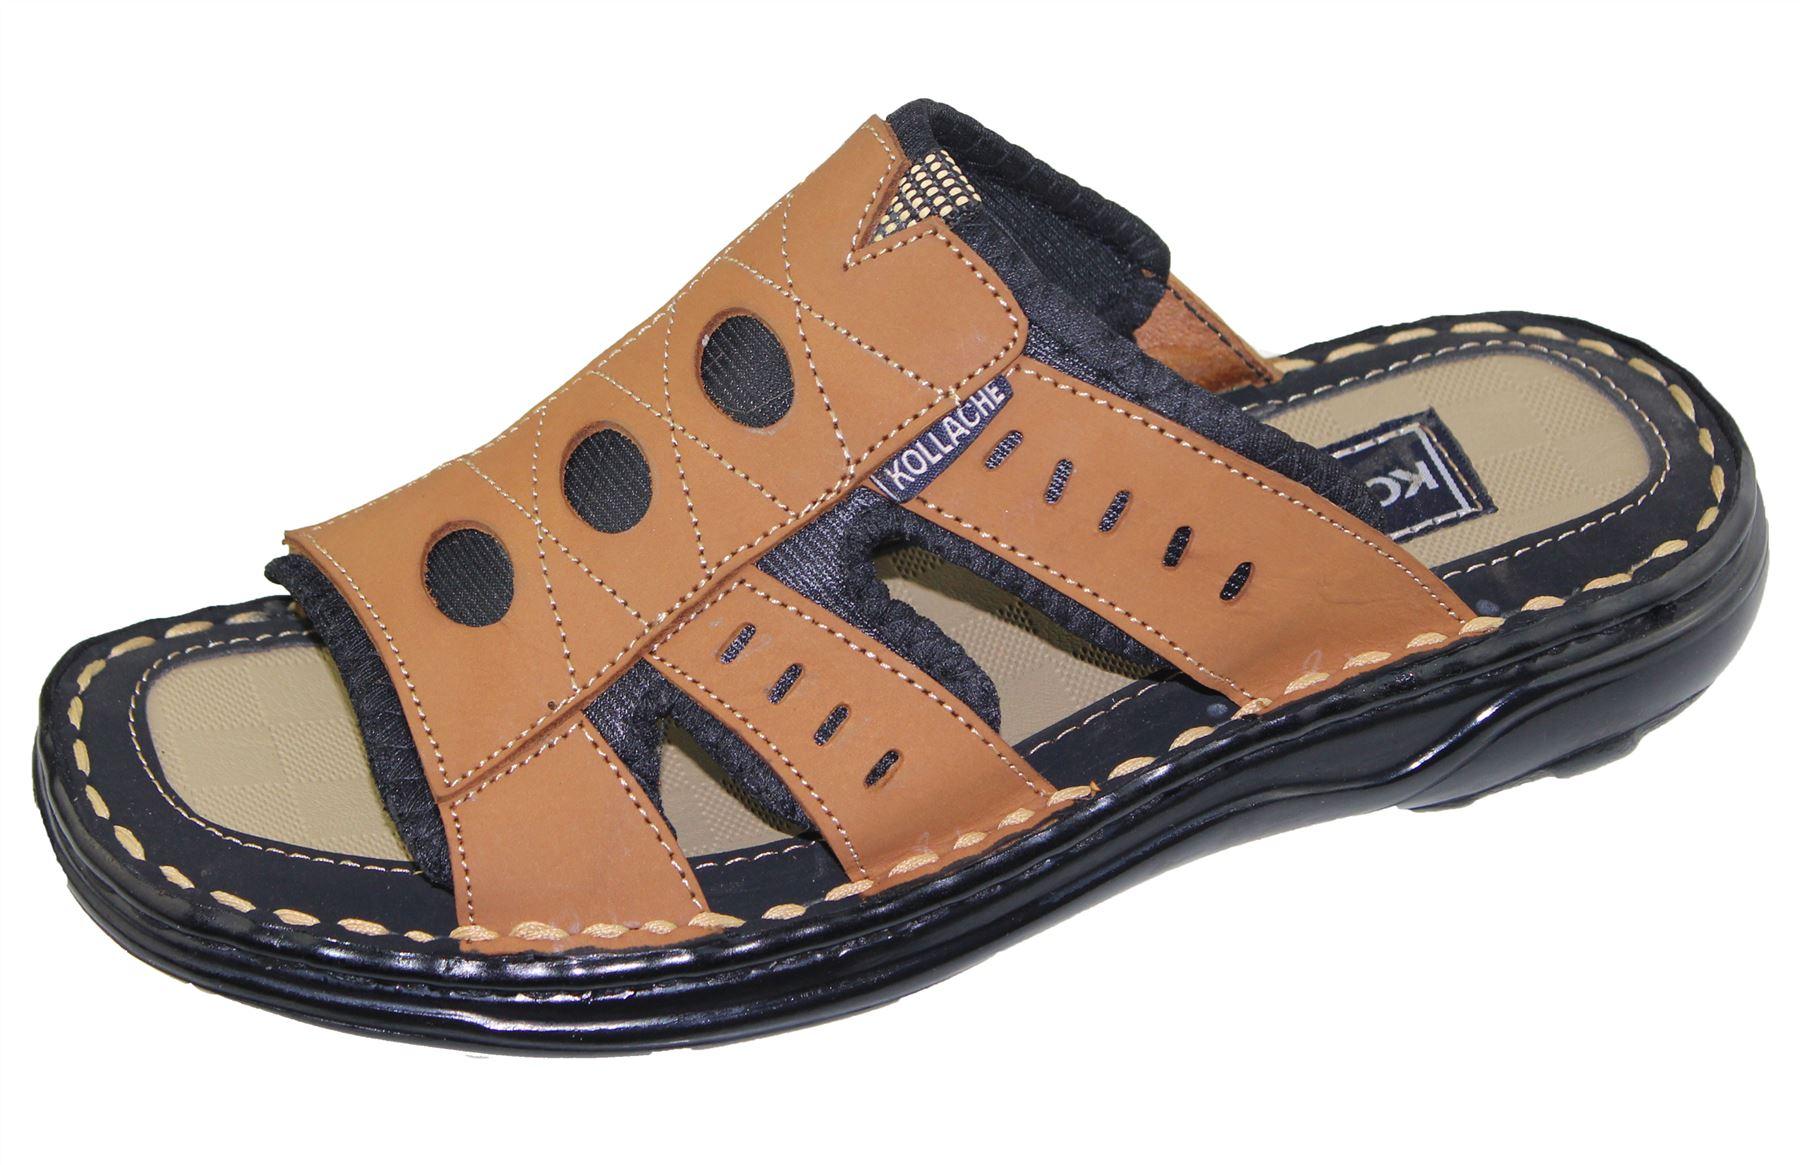 Mens-Slipper-Sandal-Sports-Beach-Buckle-Walking-Fashion-Summer-Casual-Shoes-Size miniatura 34